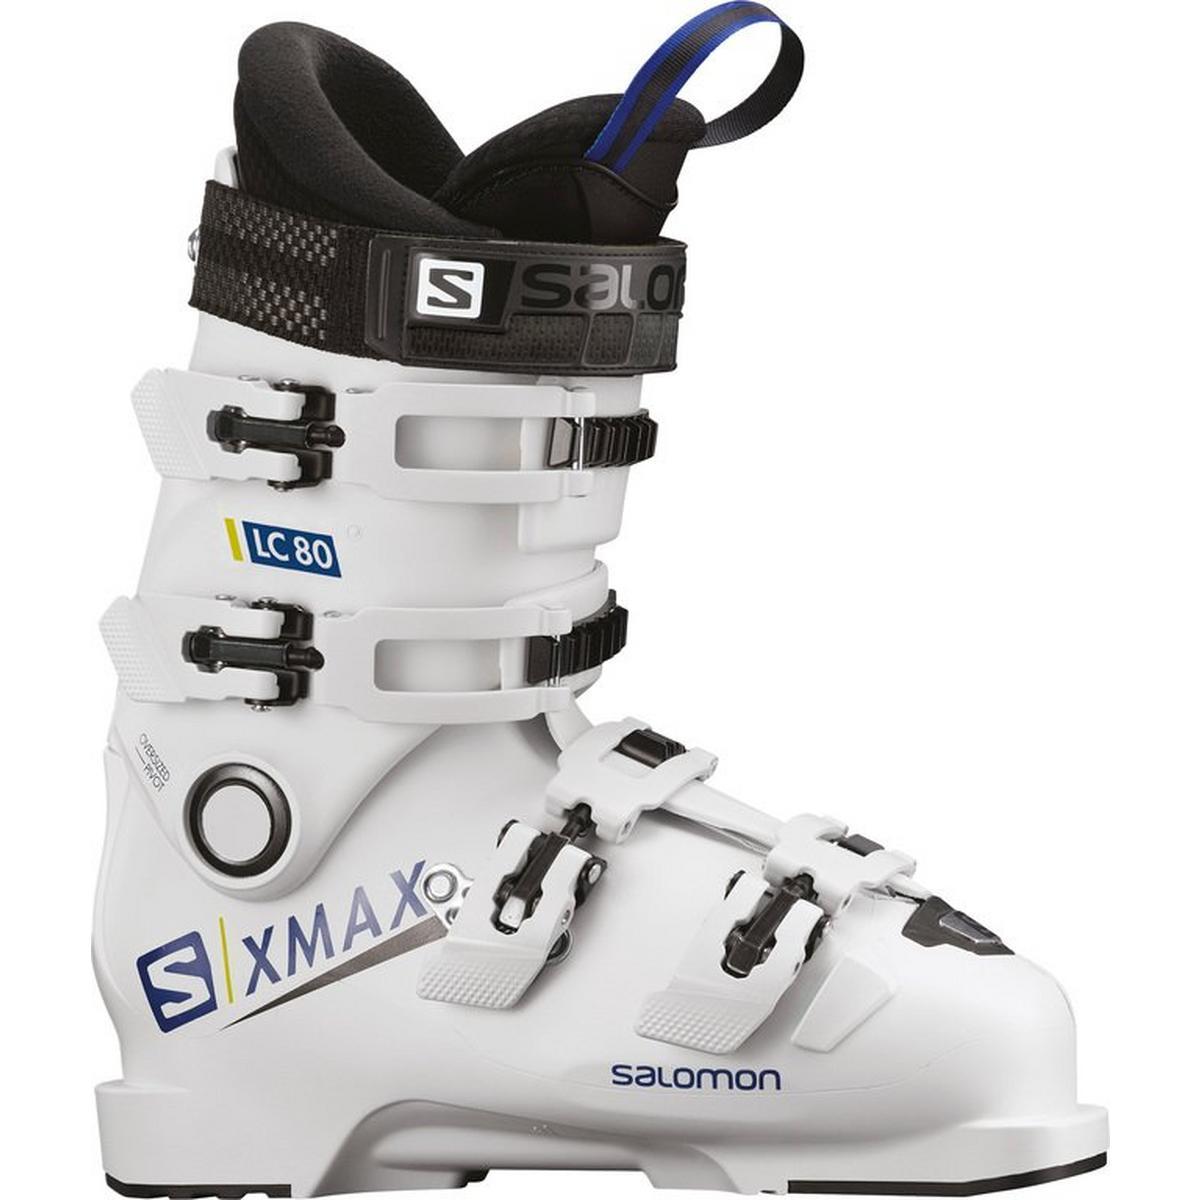 Salomon X/MAX LC 80 Junior Ski Boot - White